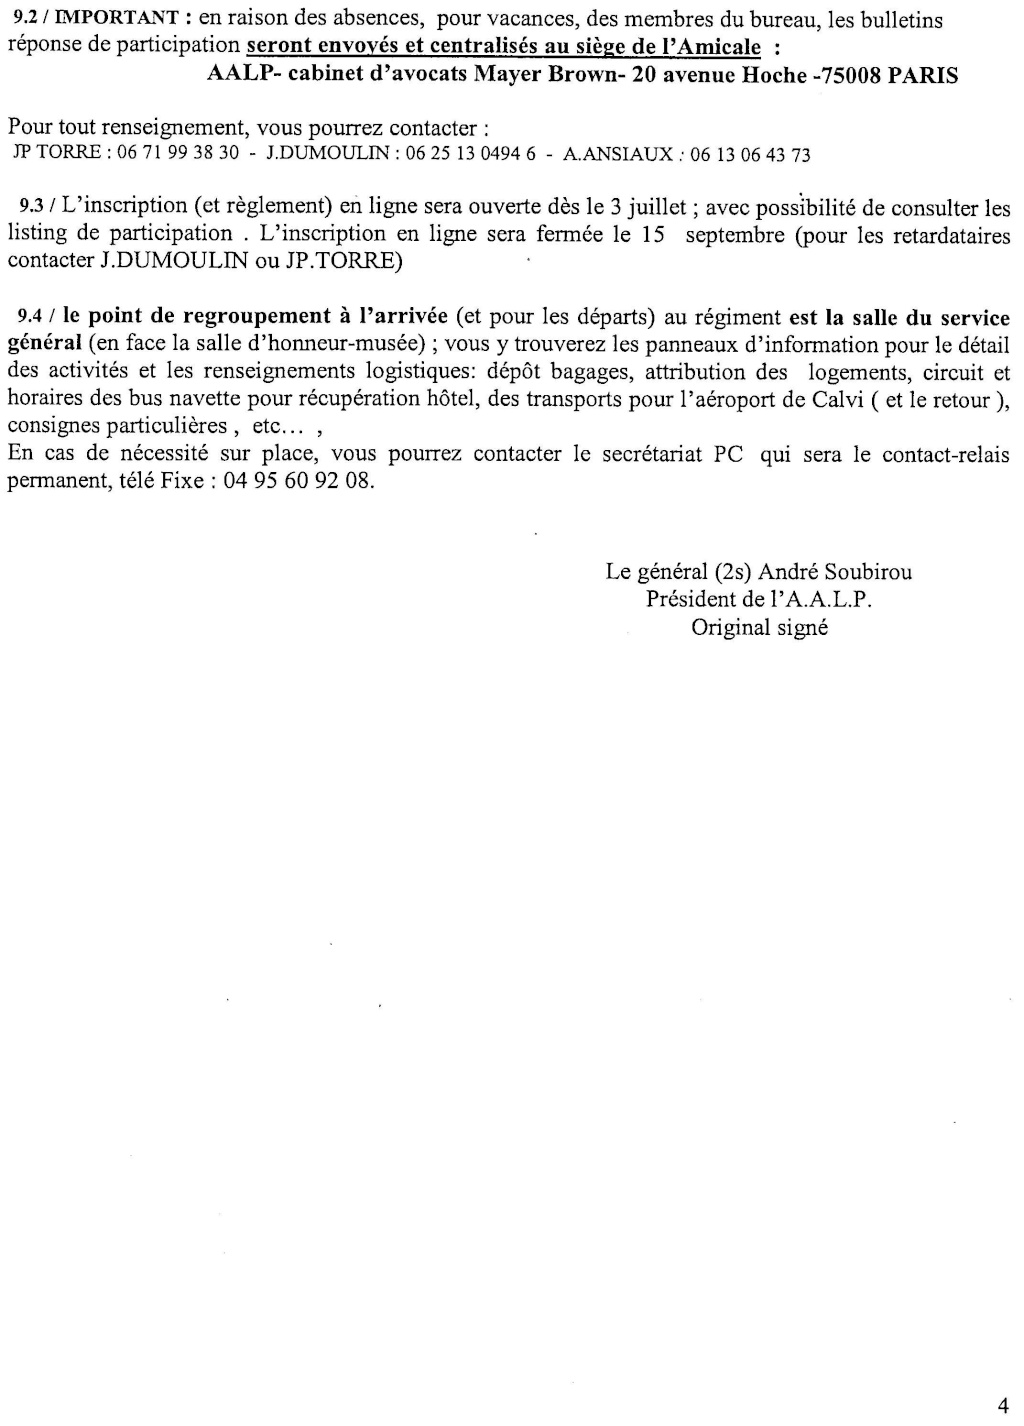 PROGRAMME SAINT MICHEL 2011 au 2 REP a CALVI File0013